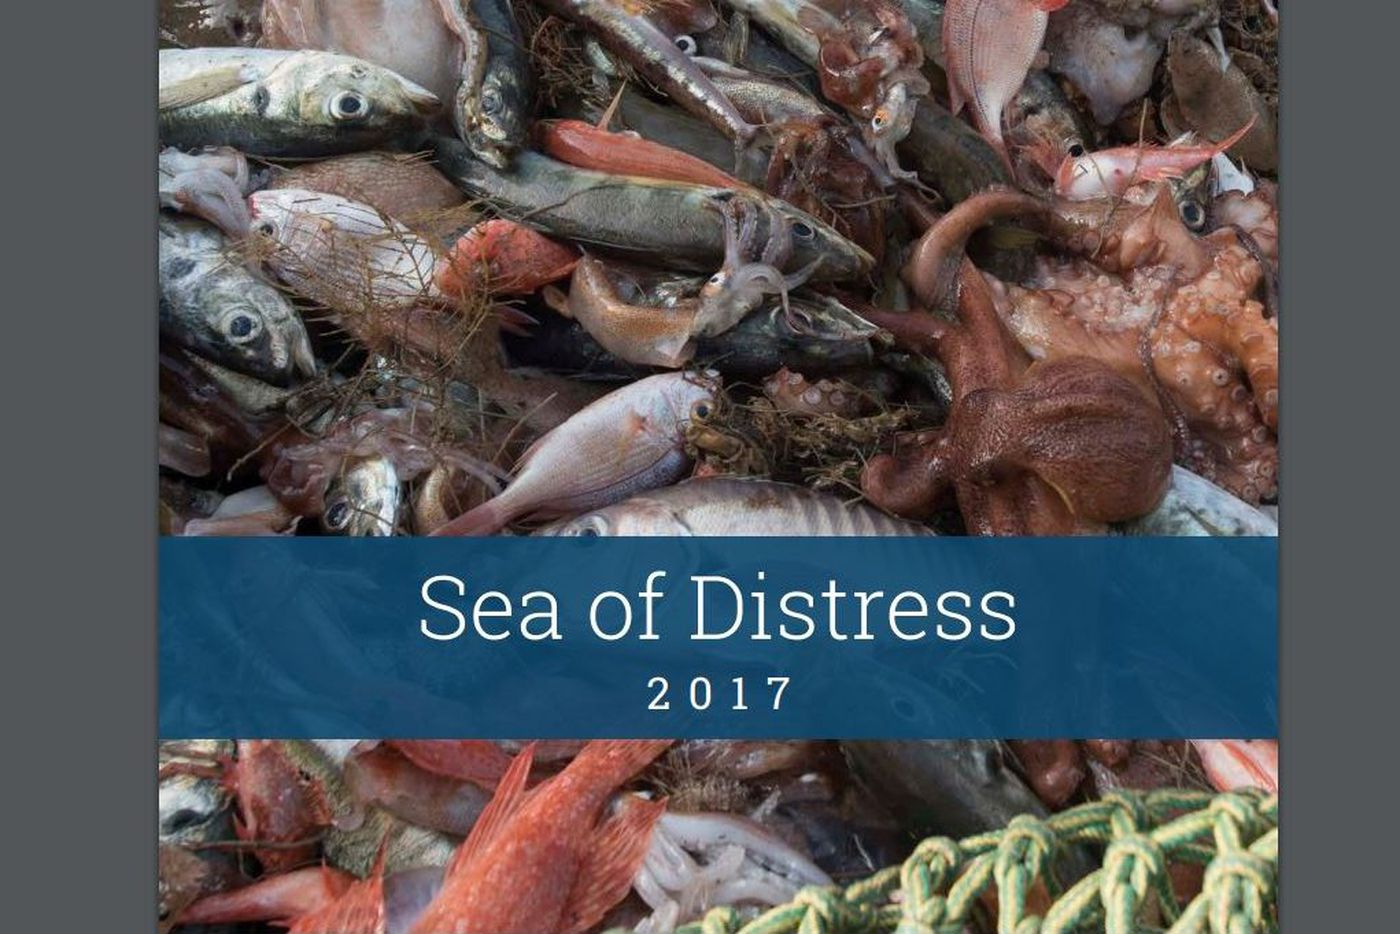 Aramark improves Greenpeace sustainable seafood score